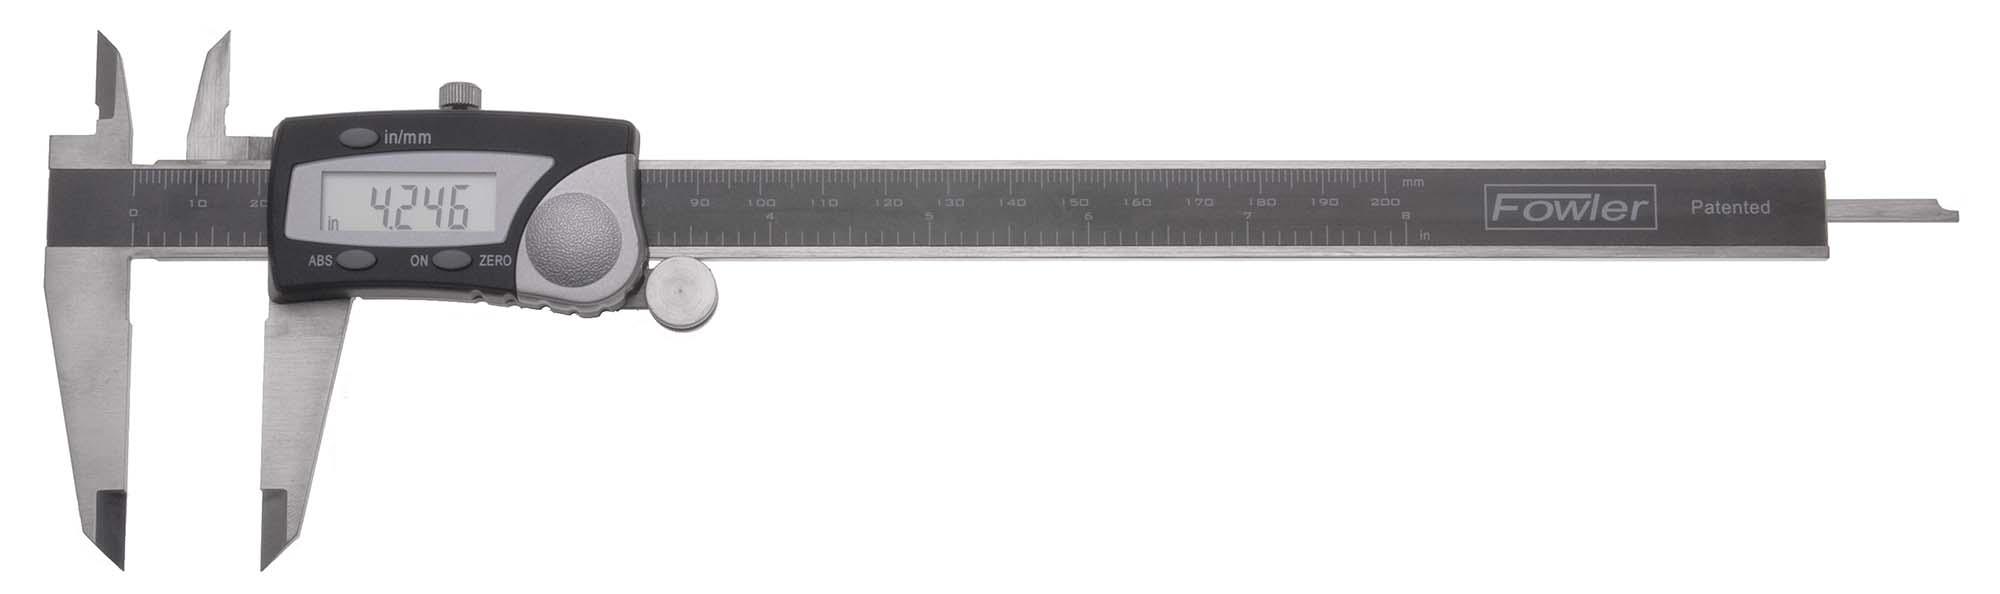 "Fowler 54-100-008 0-8"" Electronic Caliper"